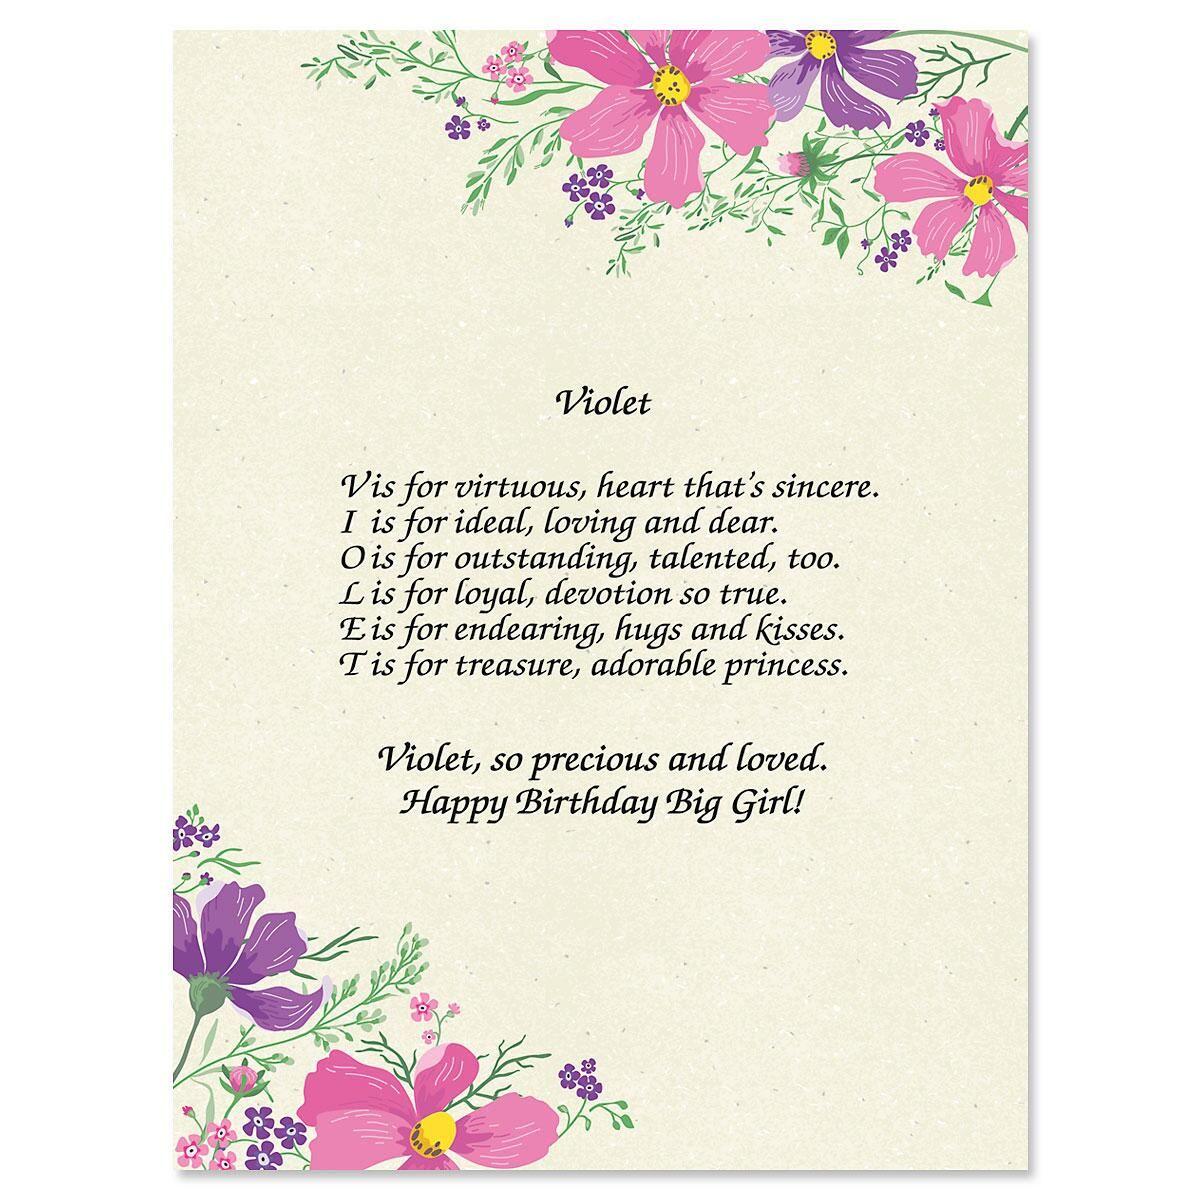 Violet name poem print colorful images violet name poem print izmirmasajfo